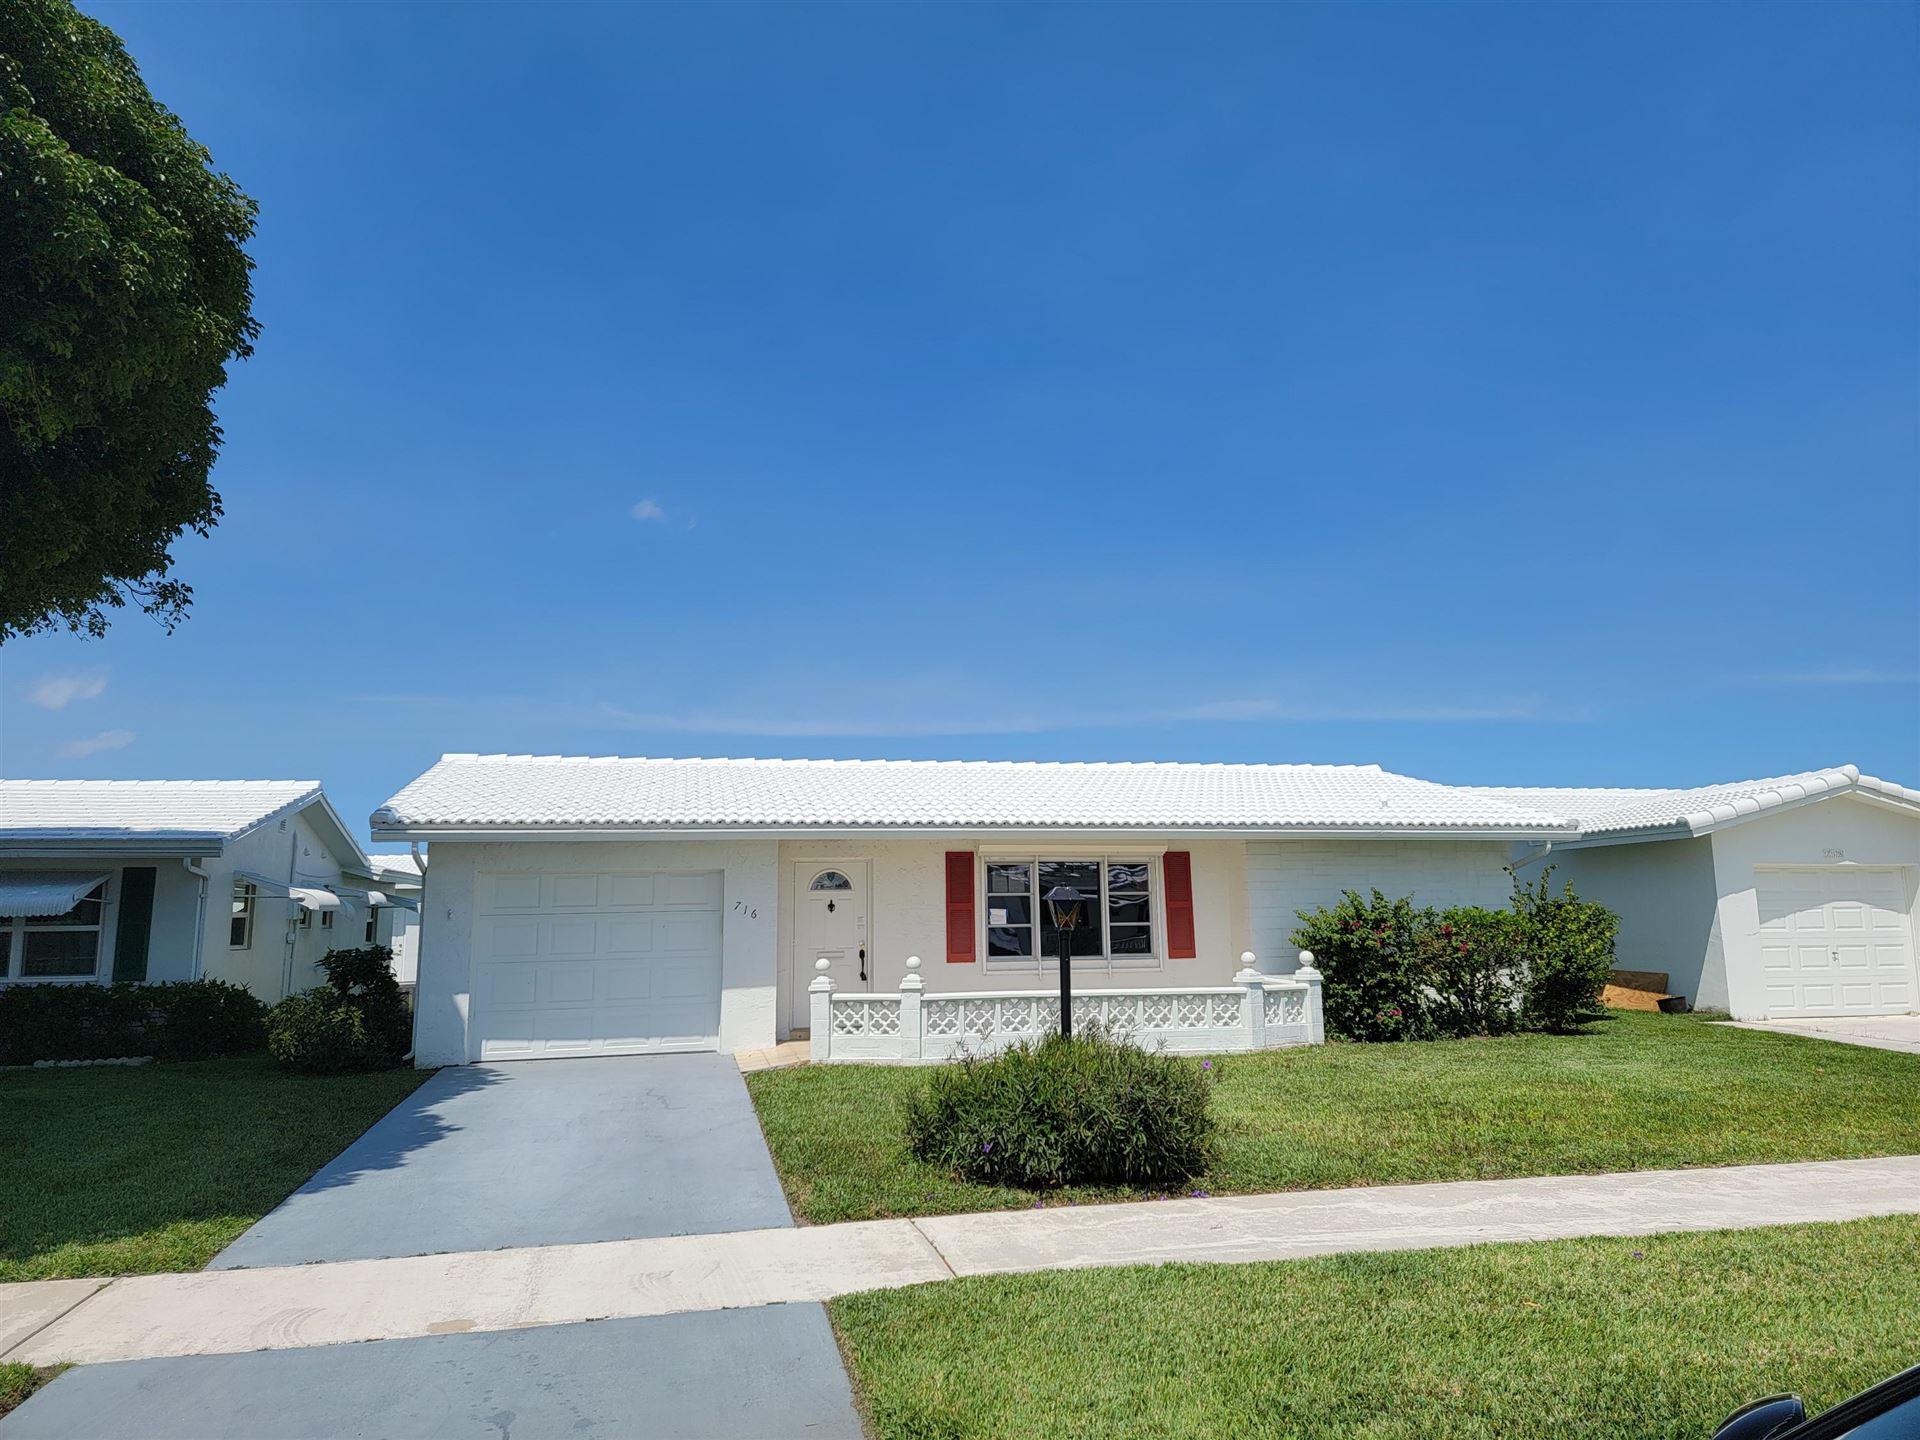 716 SW 18th Street, Boynton Beach, FL 33426 - MLS#: RX-10712736